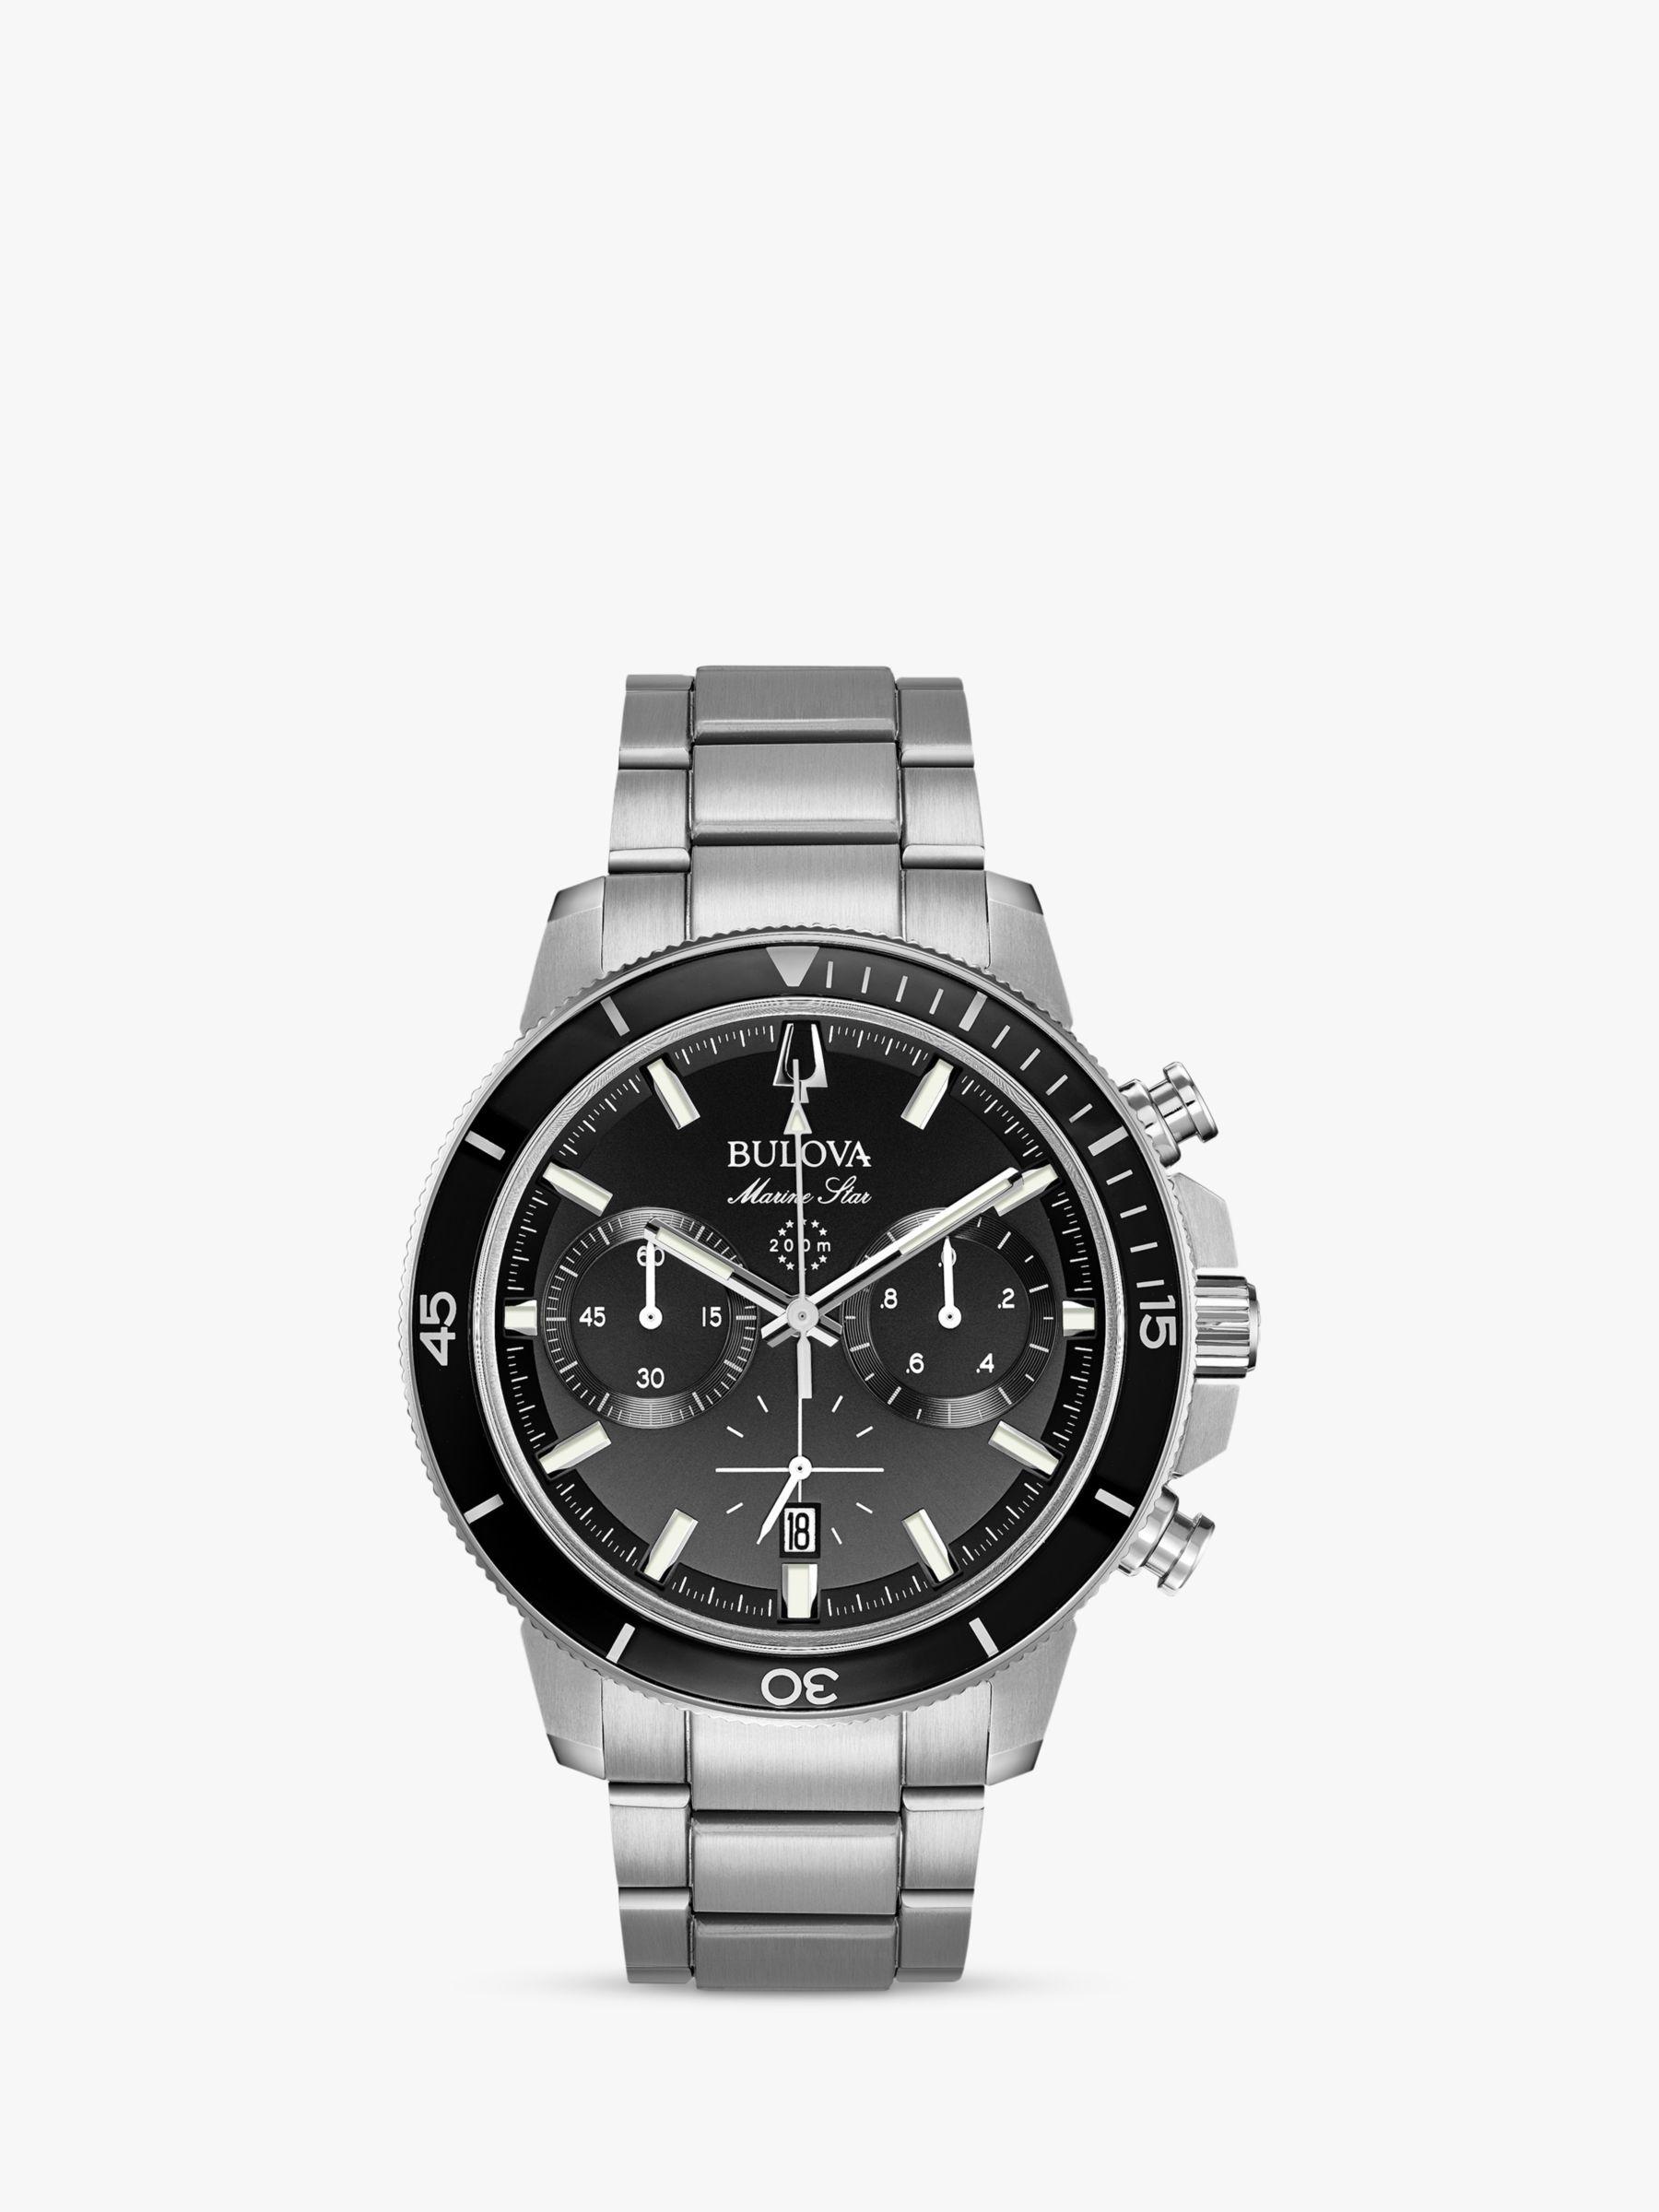 Bulova Bulova Men's Marine Star Chronograph Date Bracelet Strap Watch